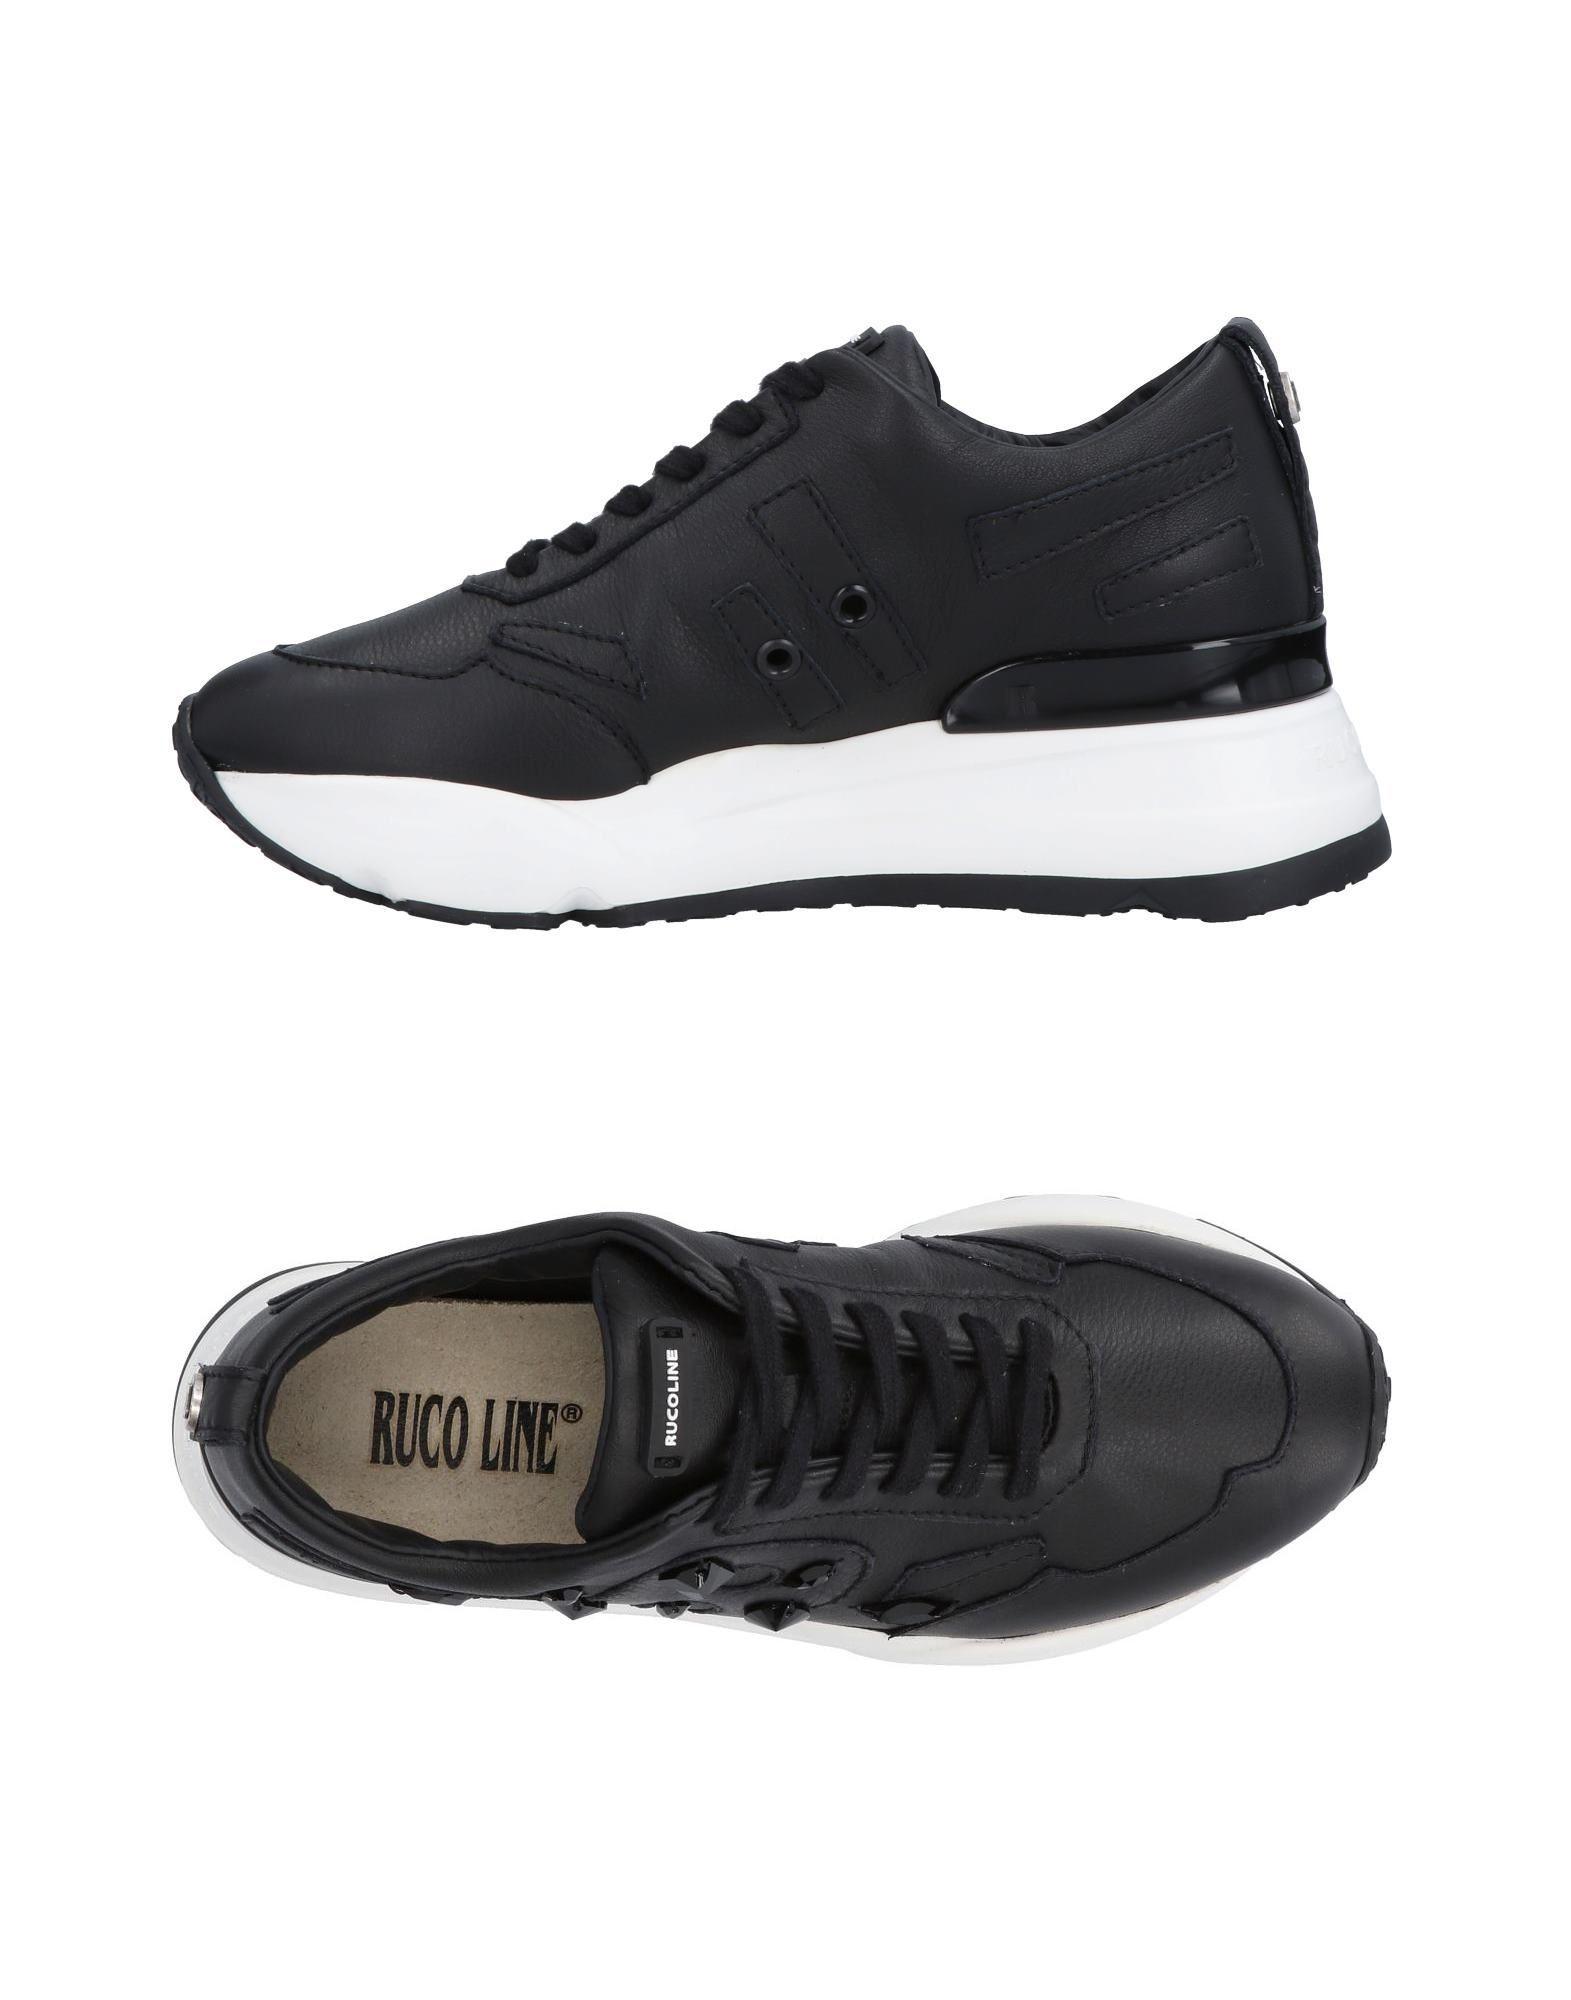 Stilvolle billige Schuhe Damen Ruco Line Sneakers Damen Schuhe  11496125OF 6128b1